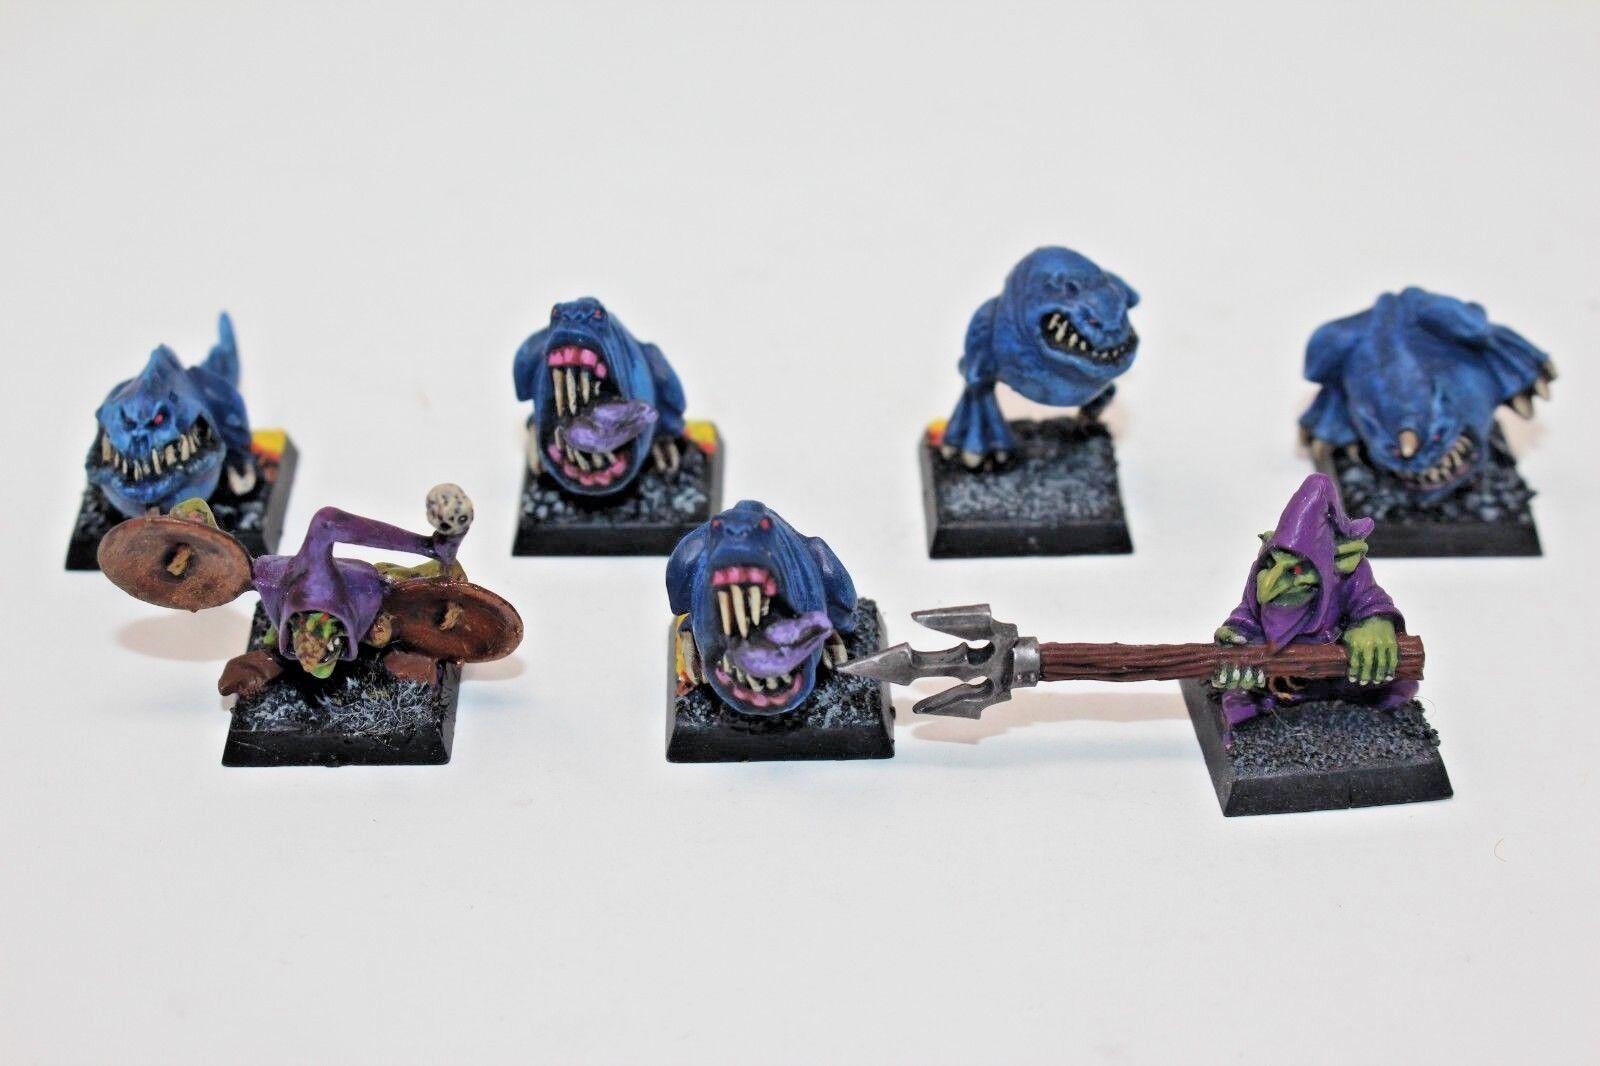 Warhammer Orcs e Goblins Squigs e Herders Metal  Well Painted - D1  benvenuto per ordinare